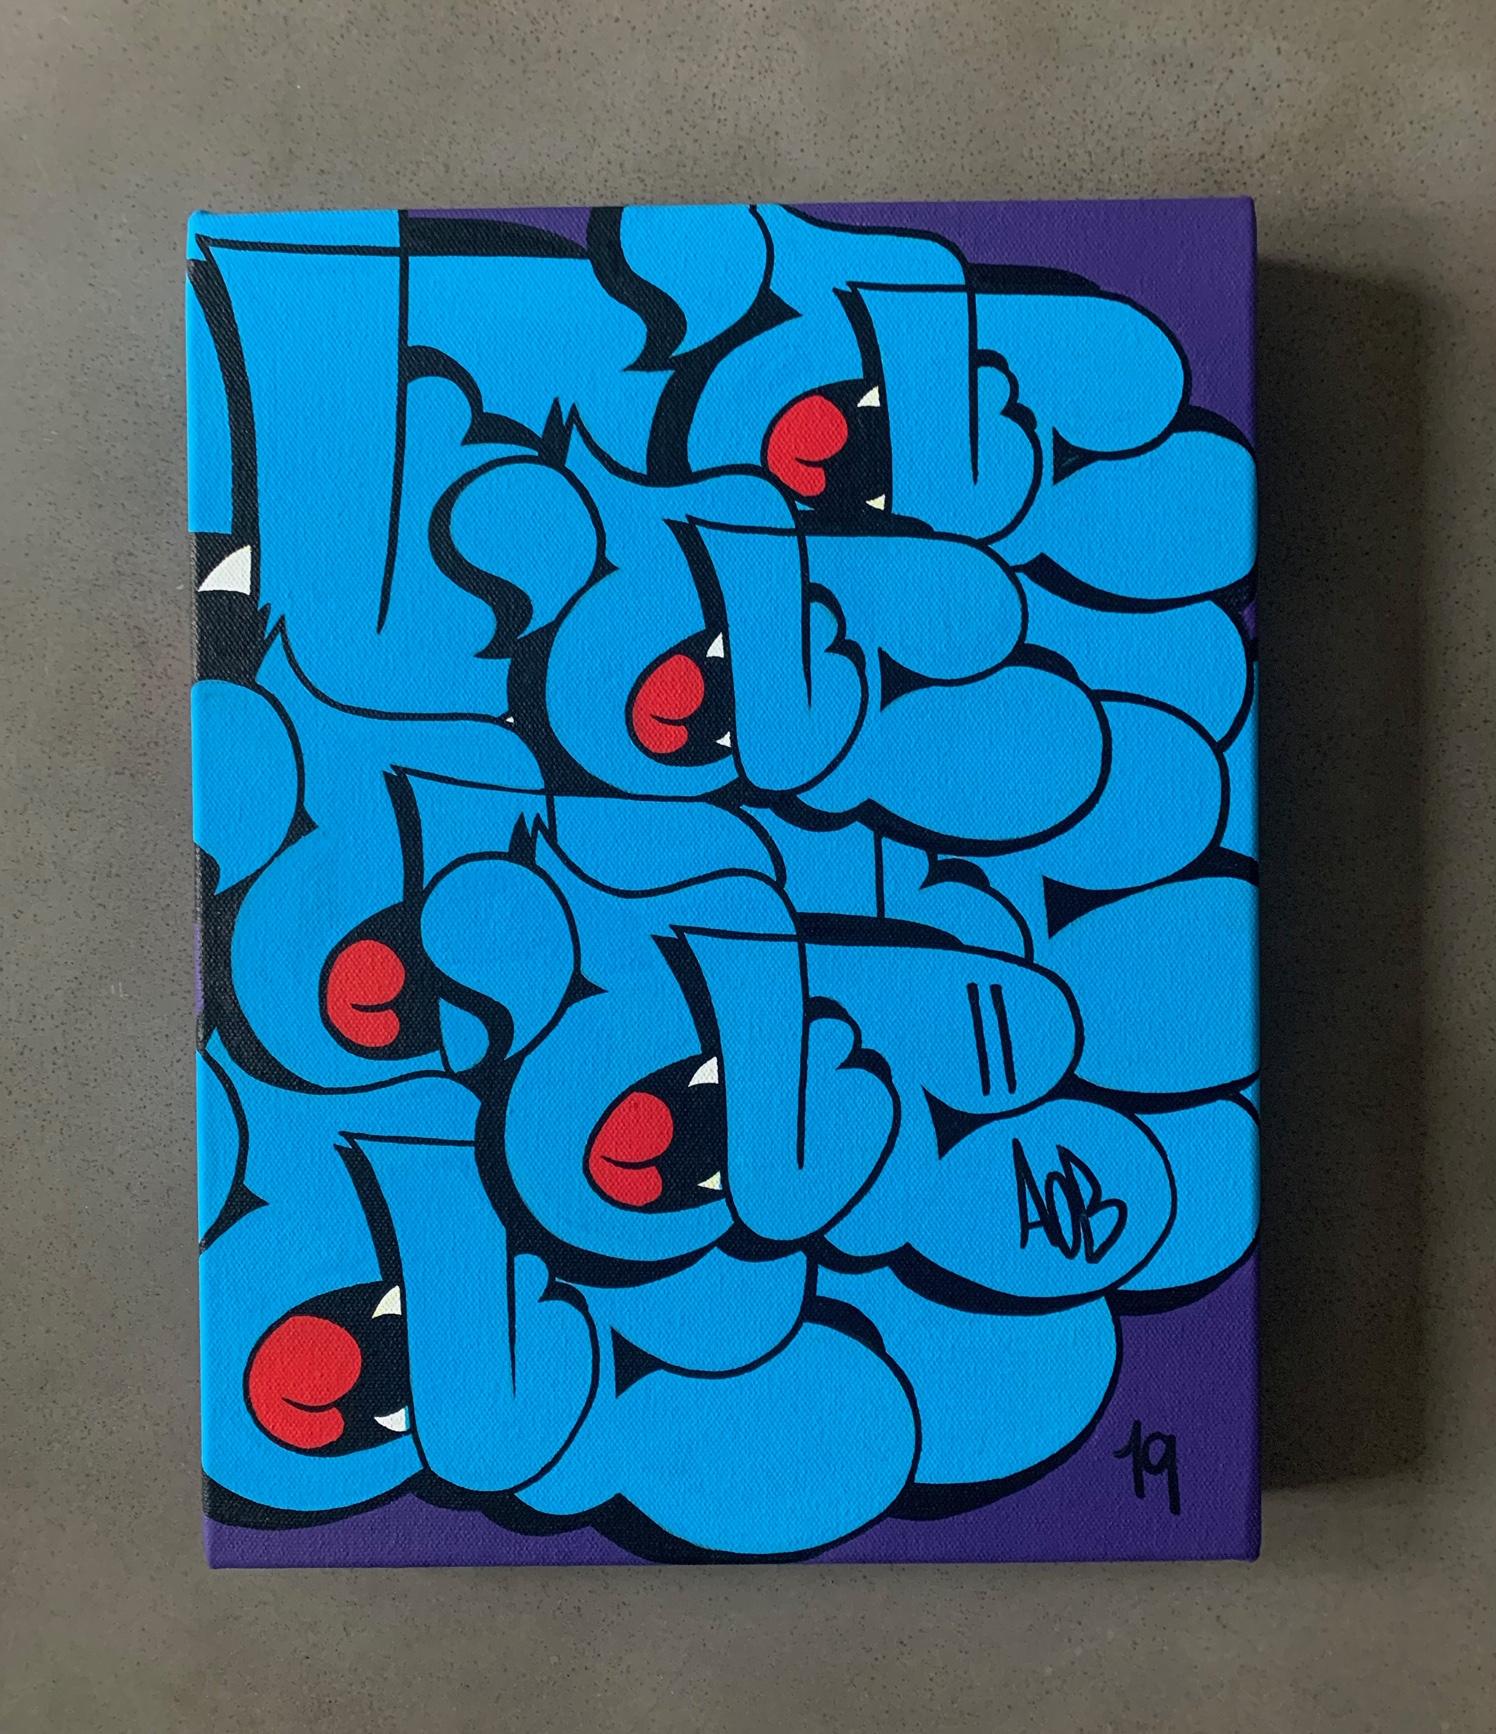 11x14' Nover Blue Throwie Canvas, 2019.